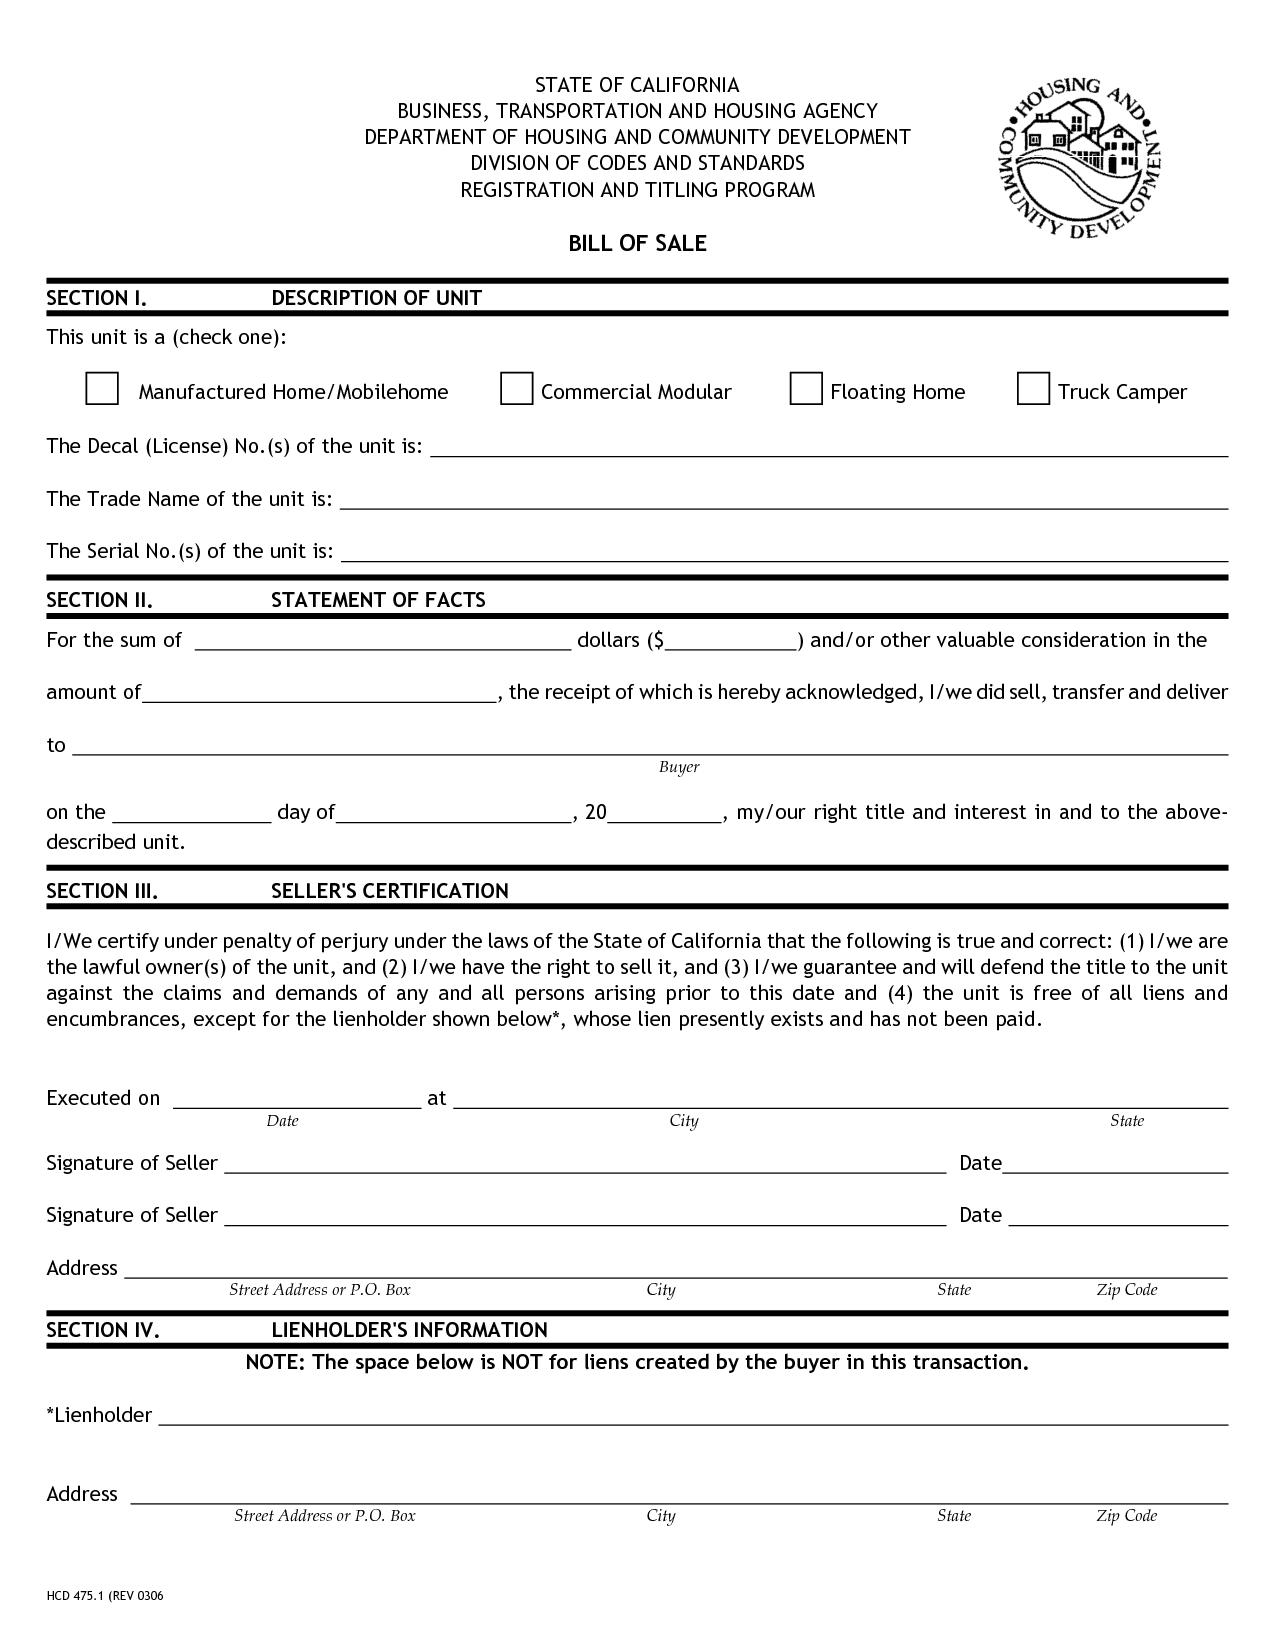 Printable Sample Printable Bill of sale for travel trailer Form ...